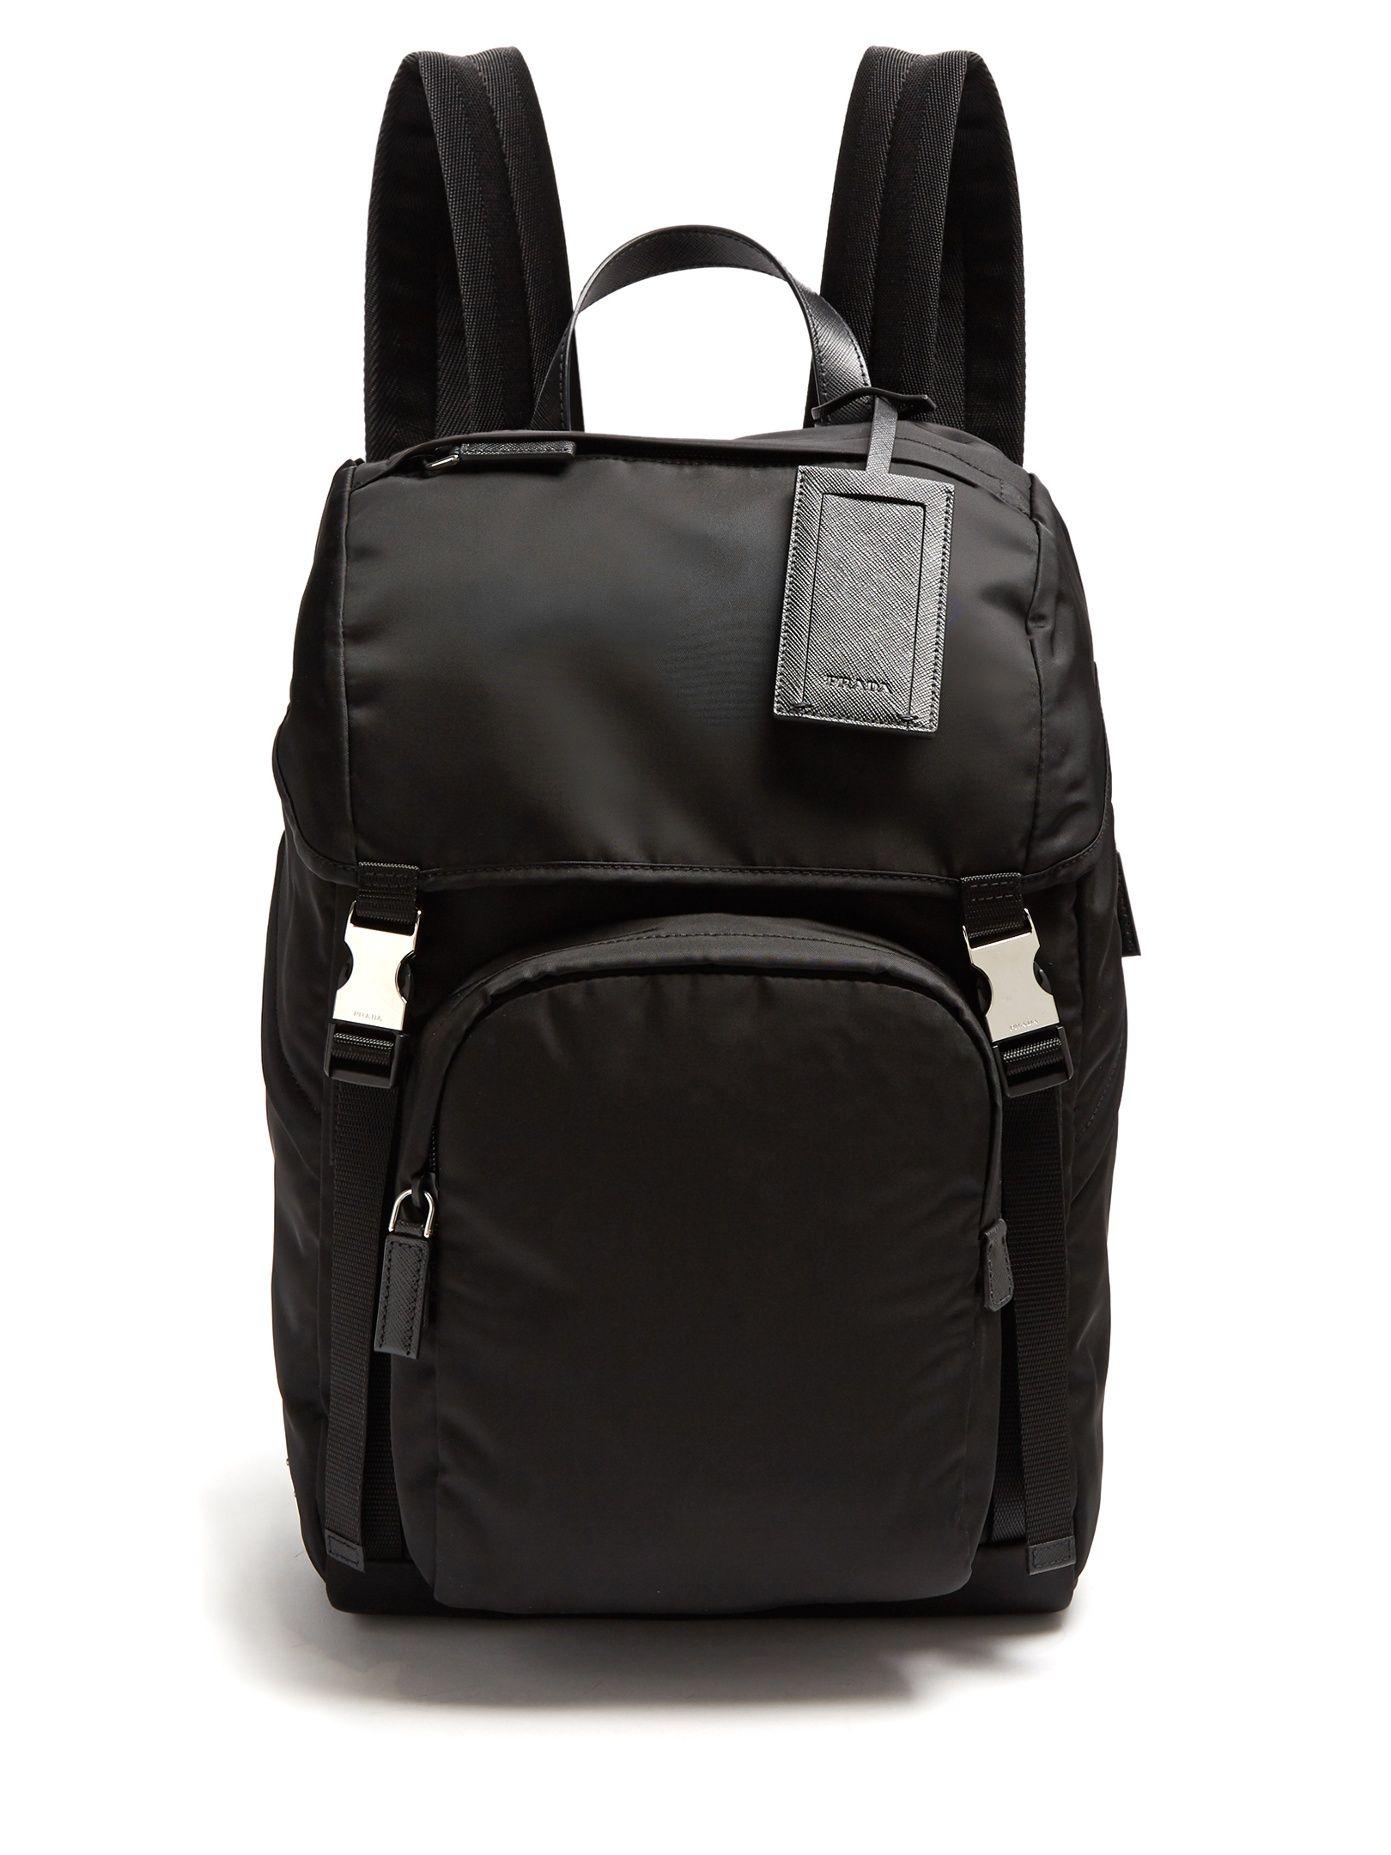 Click here to buy Prada Front-pocket nylon backpack at MATCHESFASHION.COM 958b1b09f8